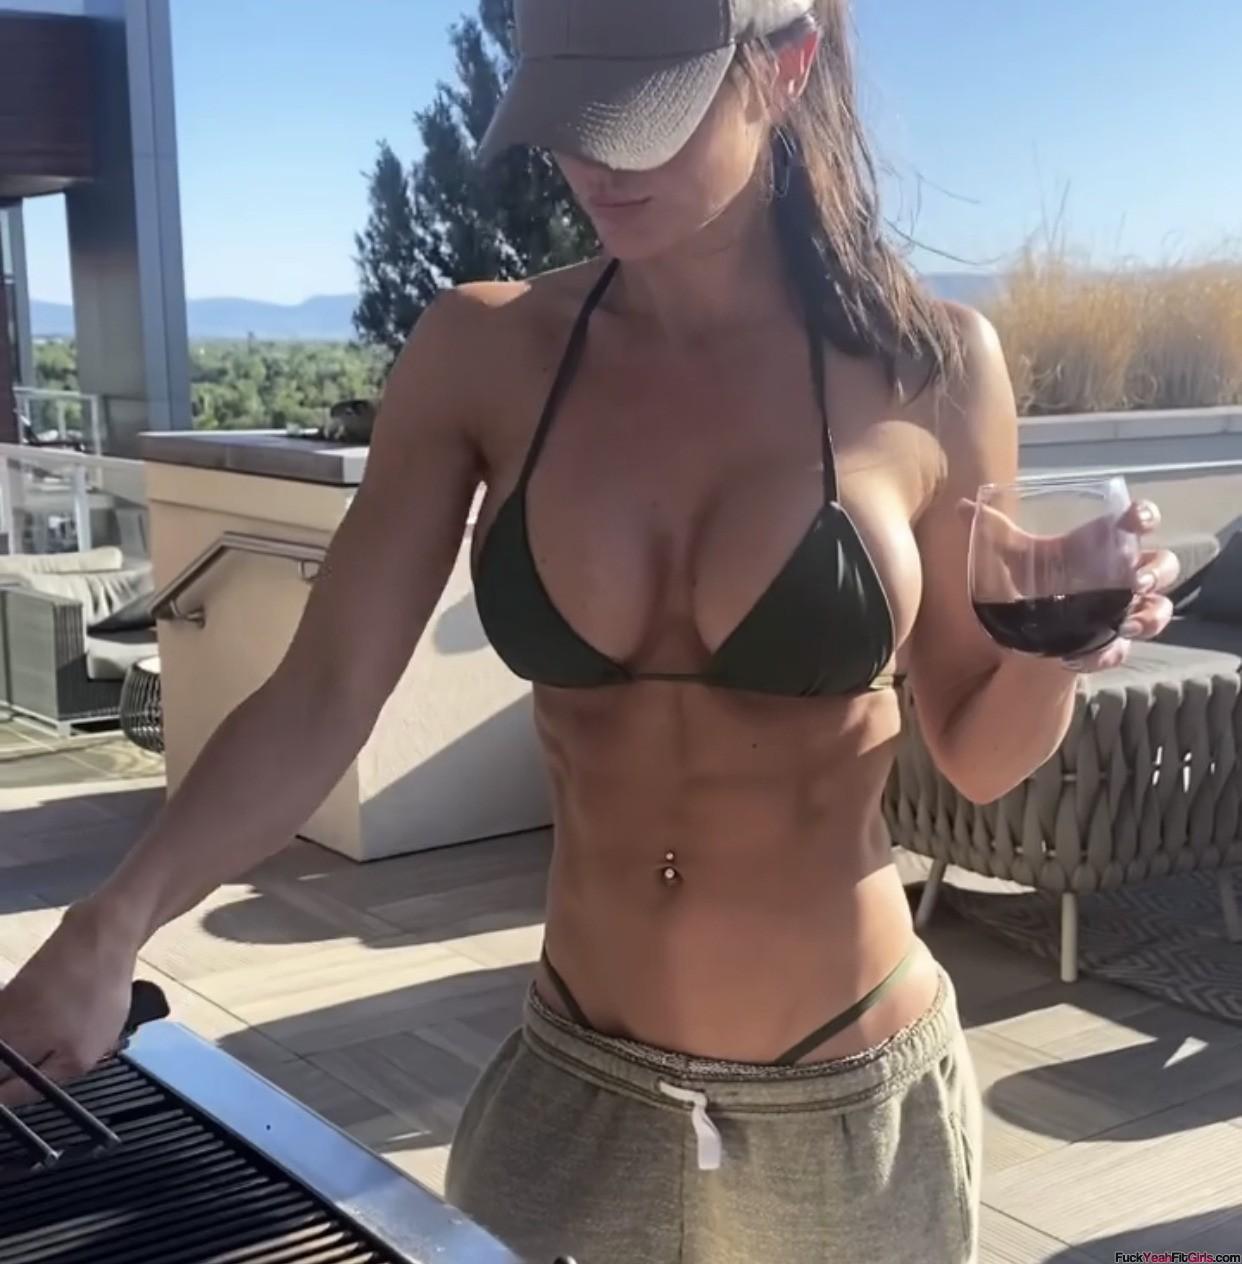 fit-bikini-babe-02